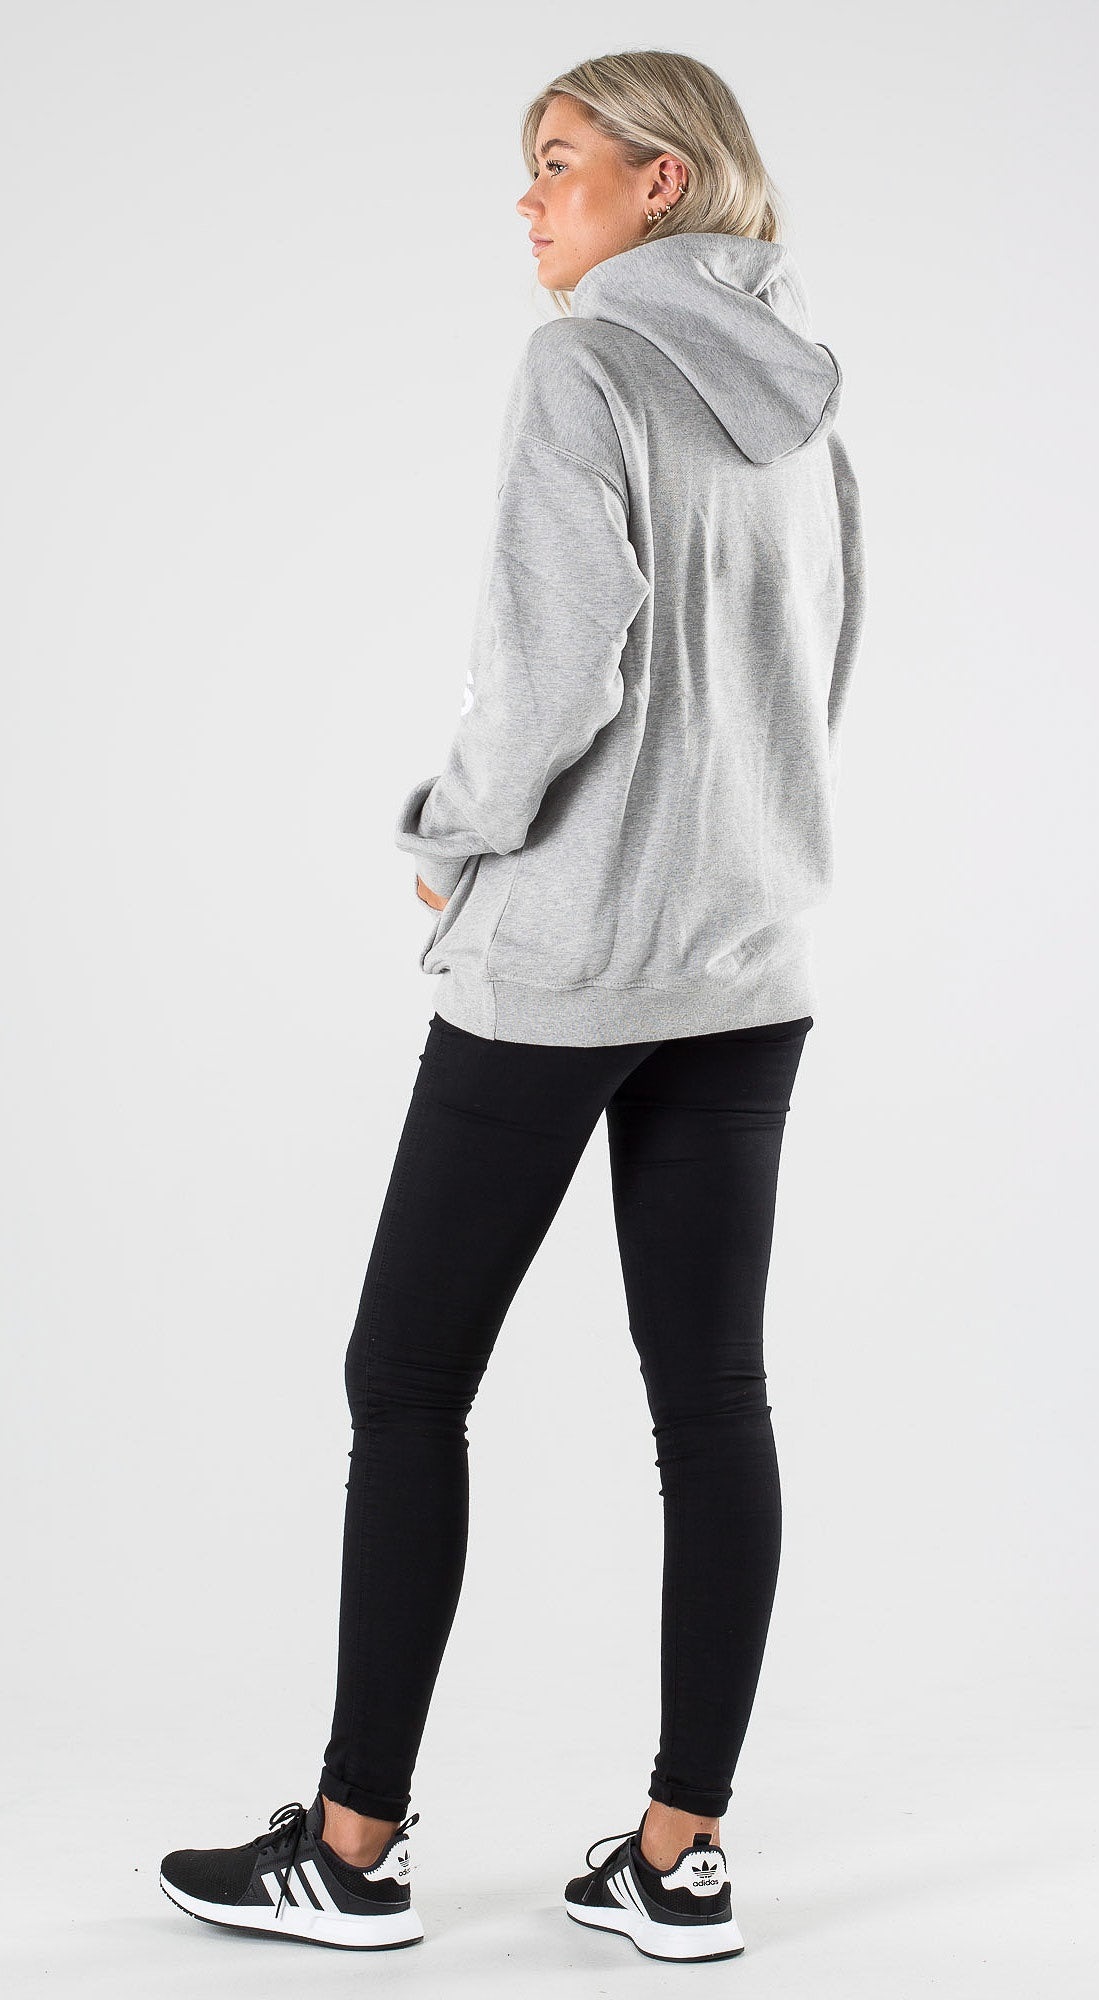 Adidas Originals Trefoil Hoodie Medium Grey Heather White